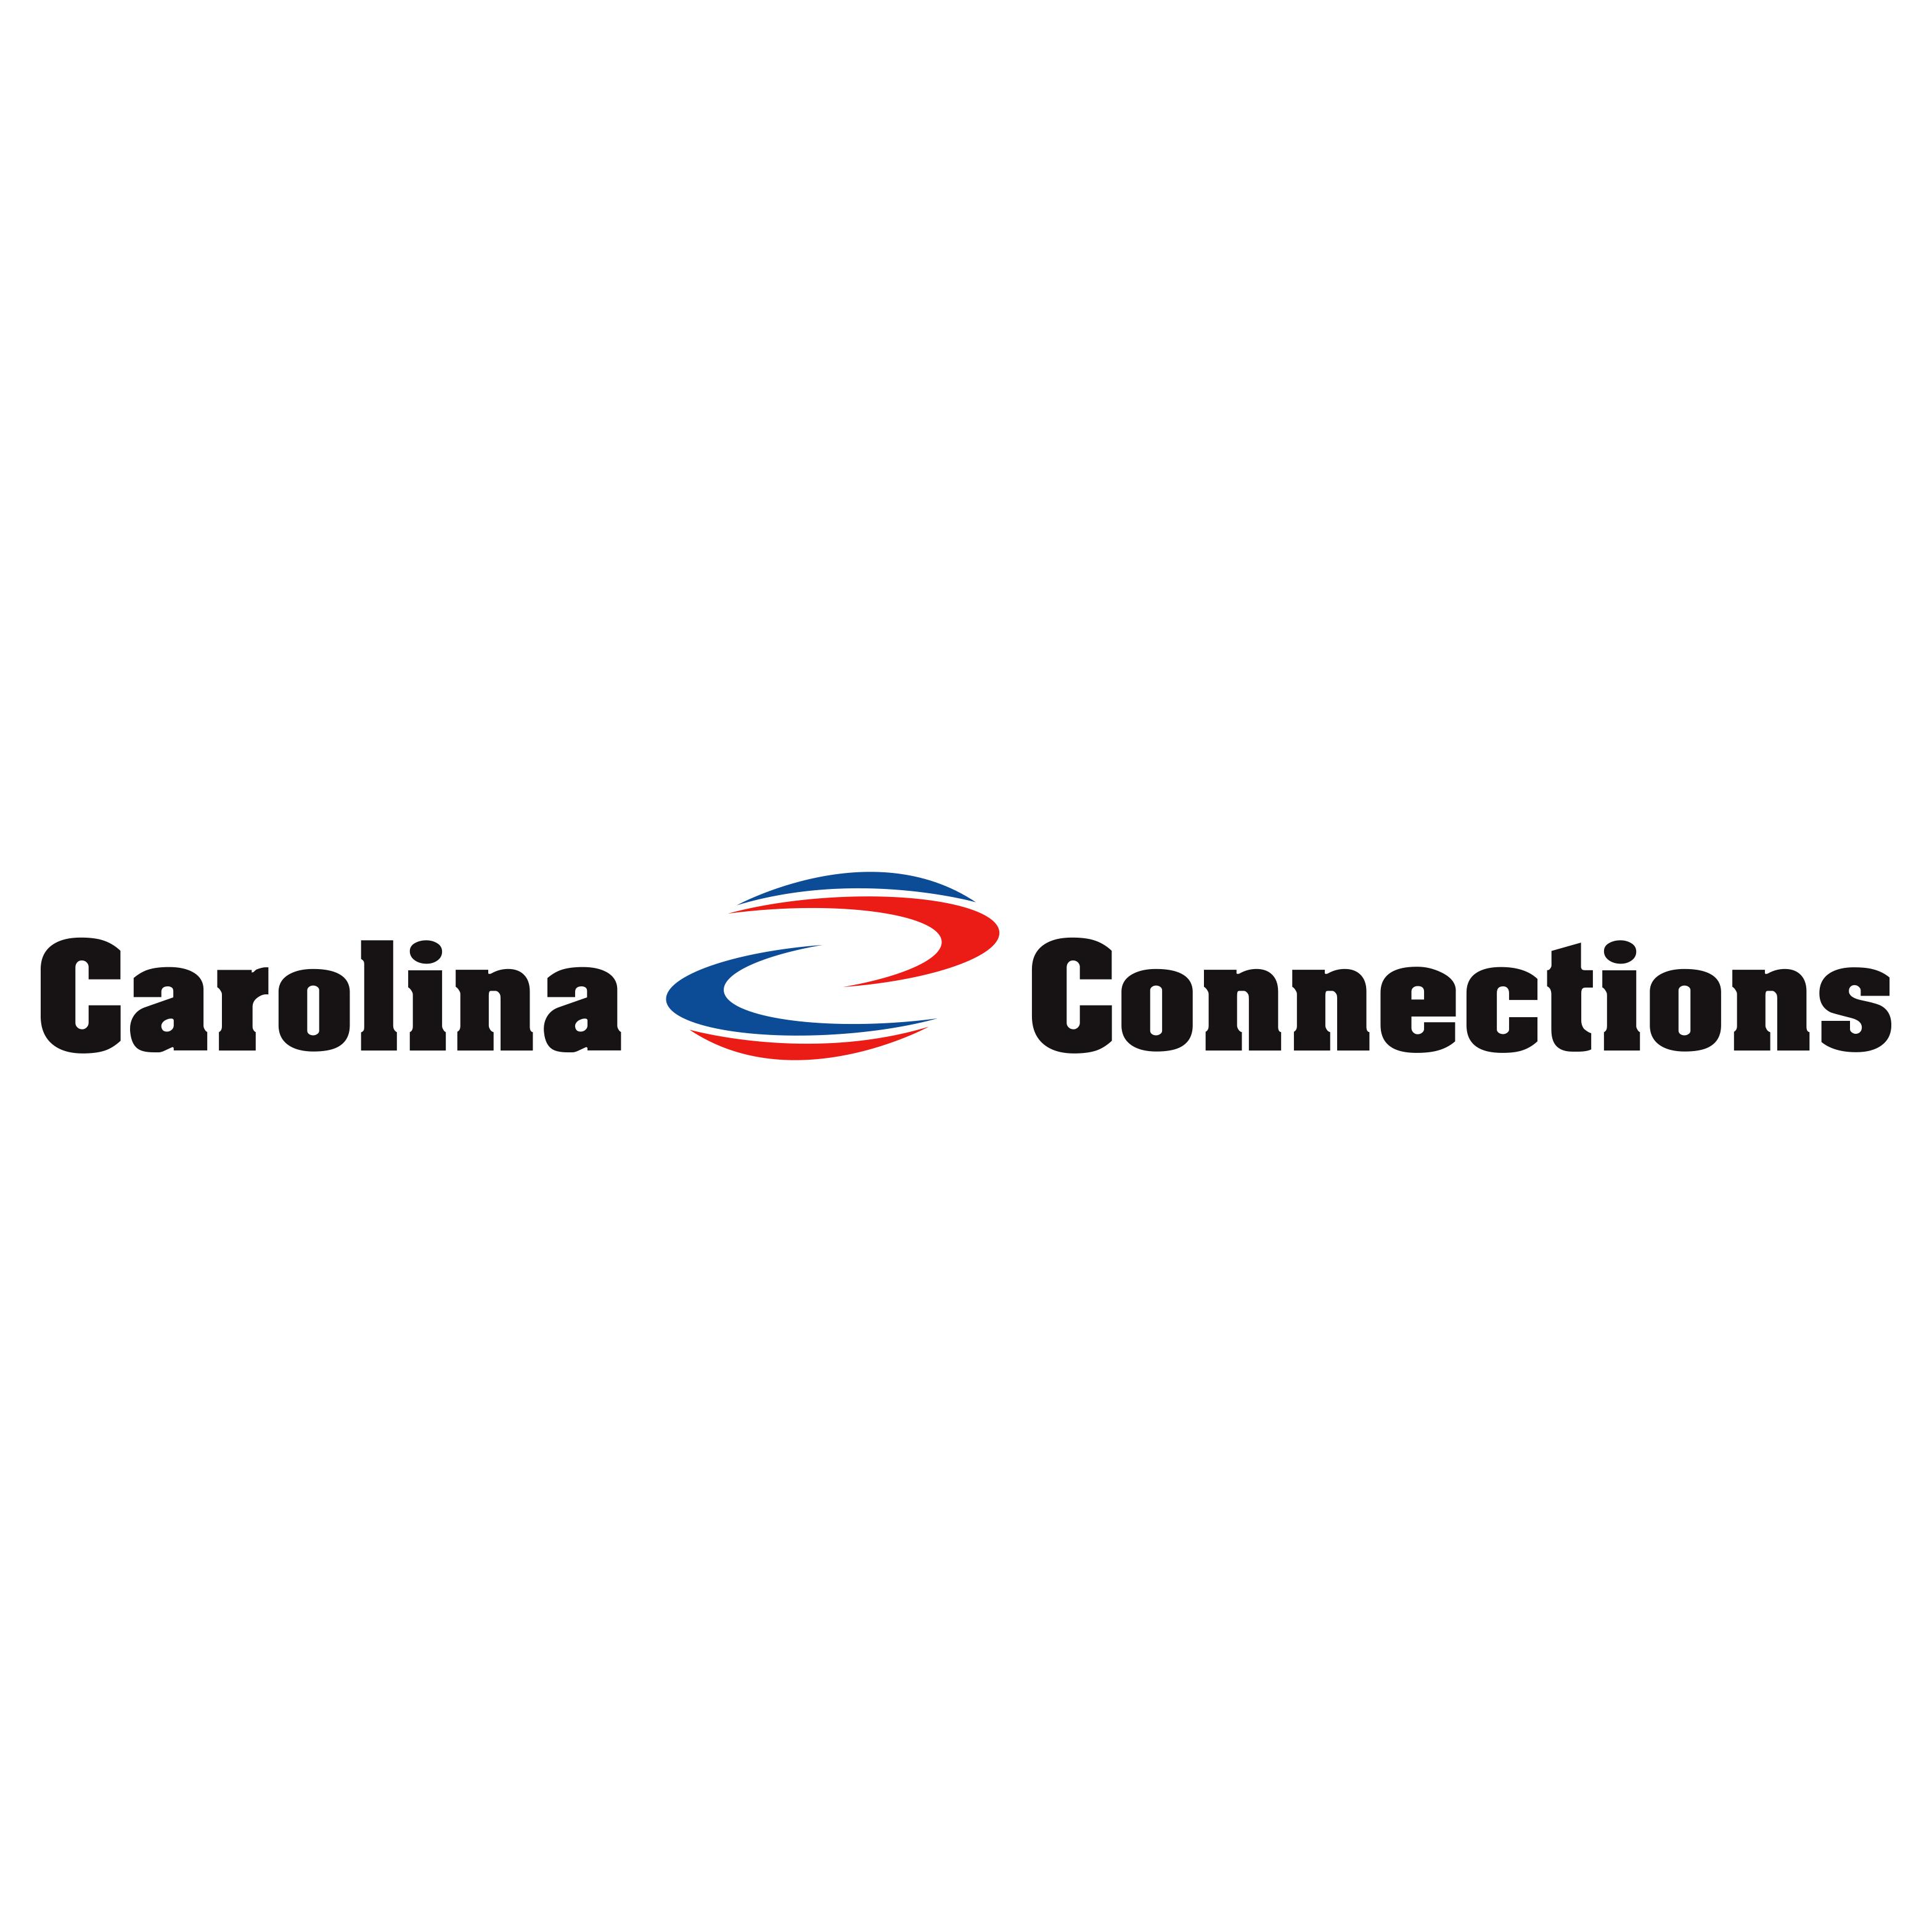 Carolina Connections